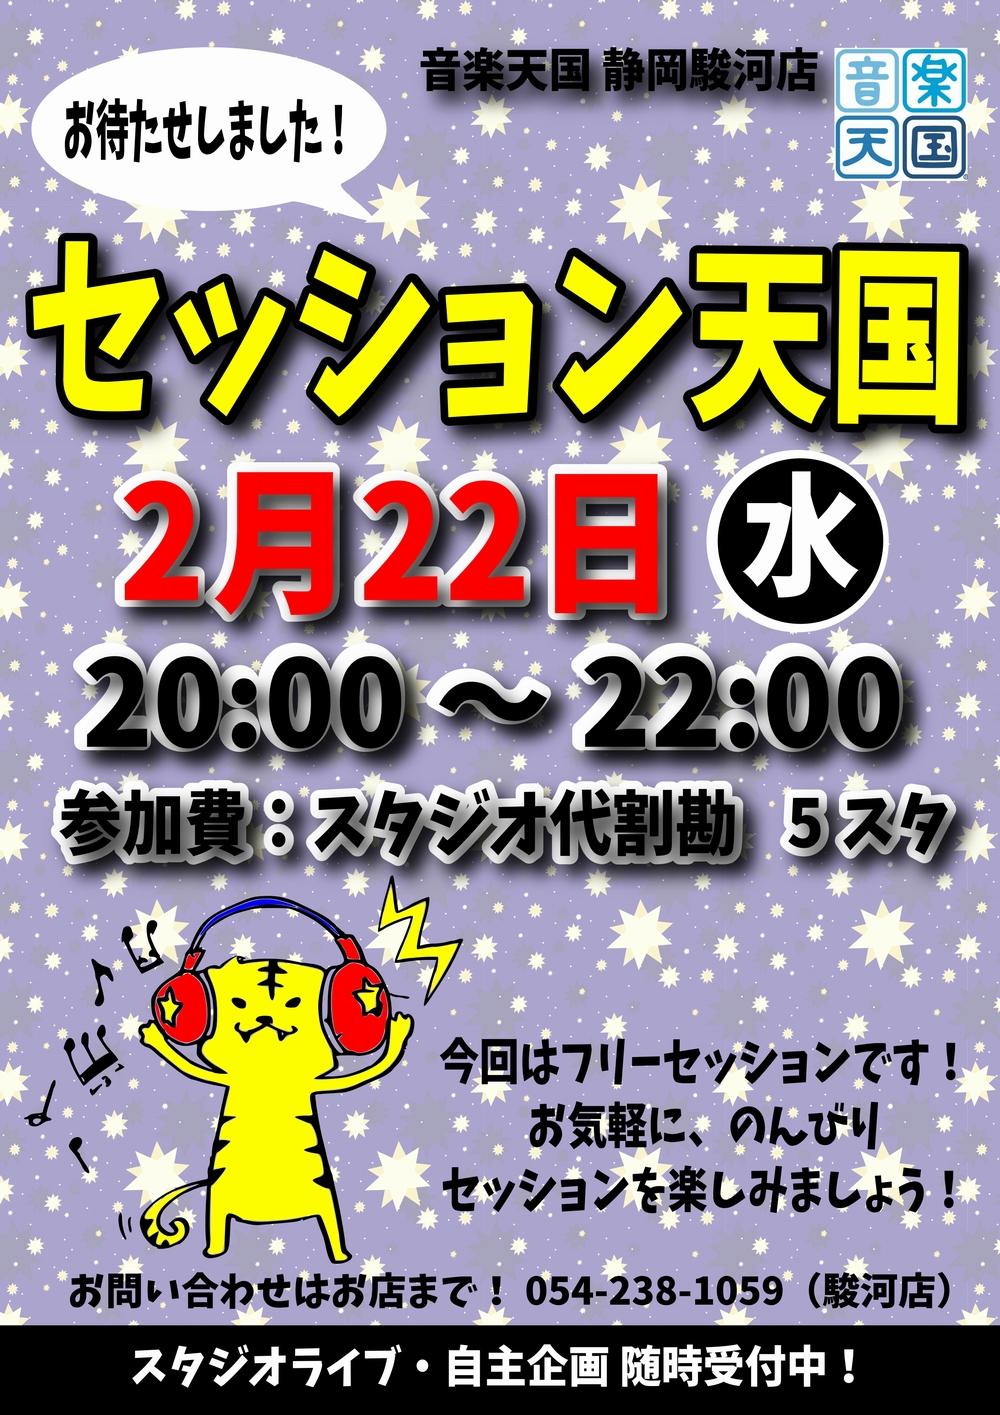 【セッション天国】音楽天国・静岡駿河店2月22日(水)開催!